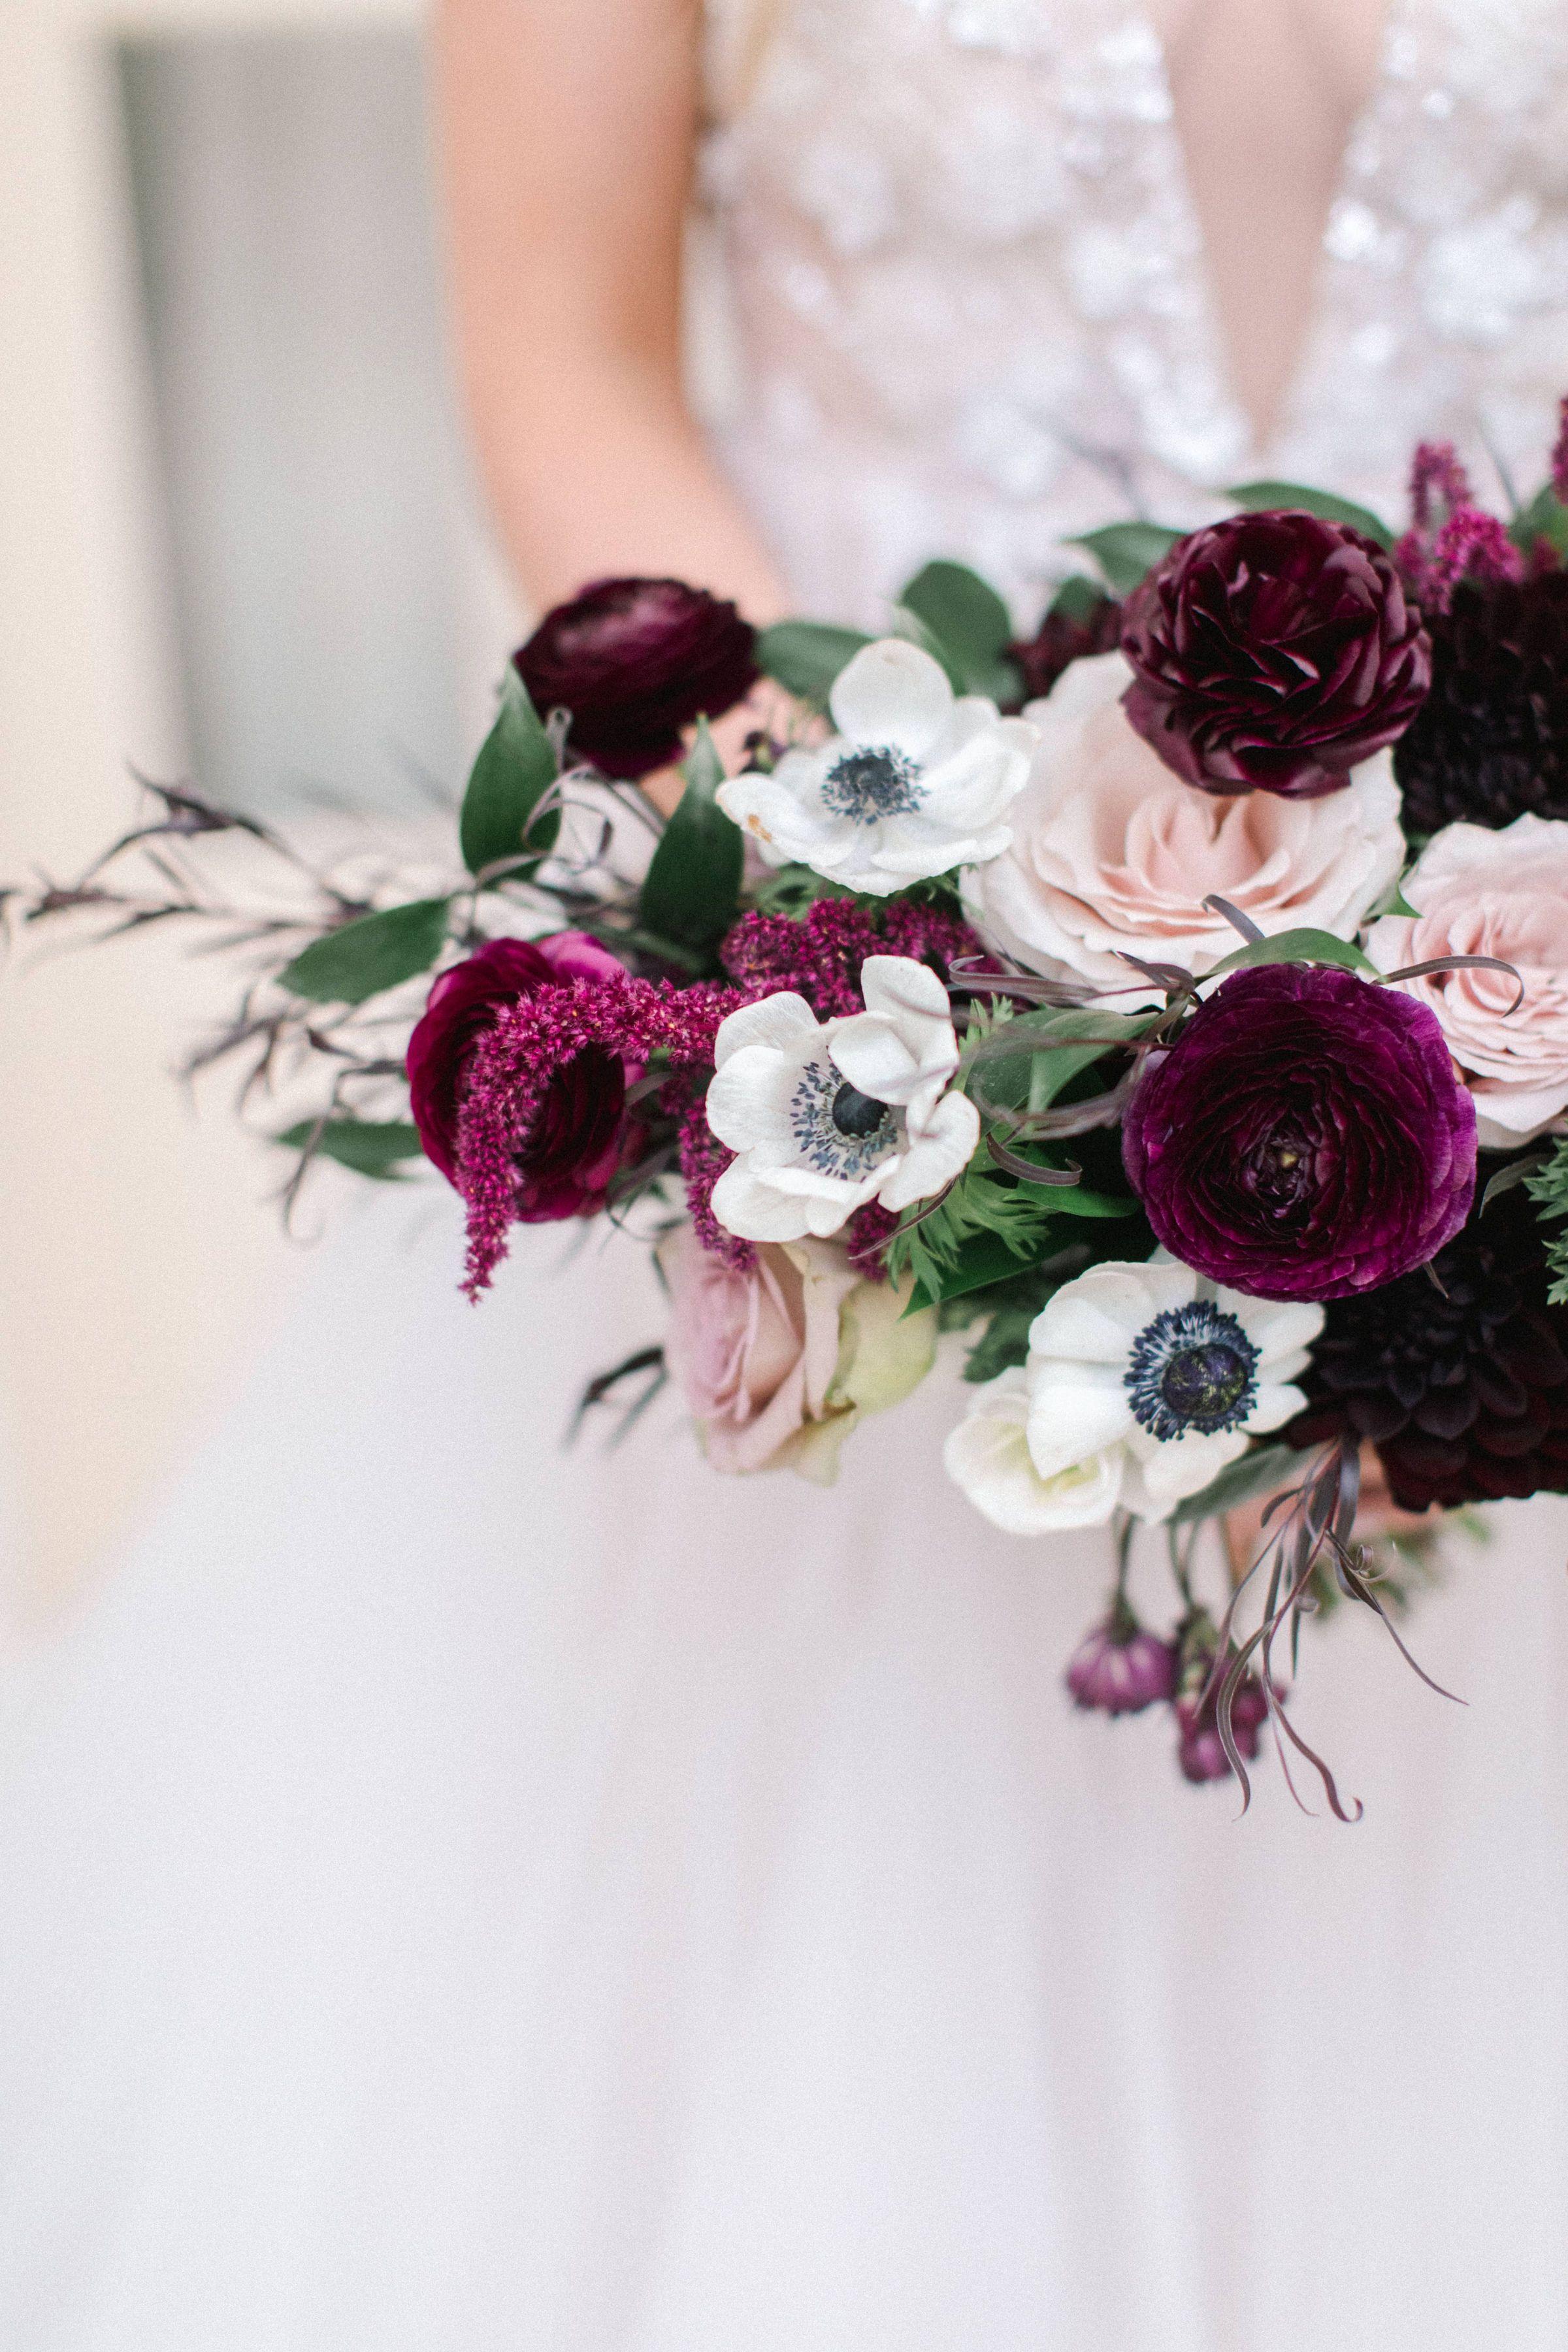 Bridal Bouquet With Plum Ranunculus And Panda Anemones Plum Wedding Flowers Bridal Flowers Wedding Flowers